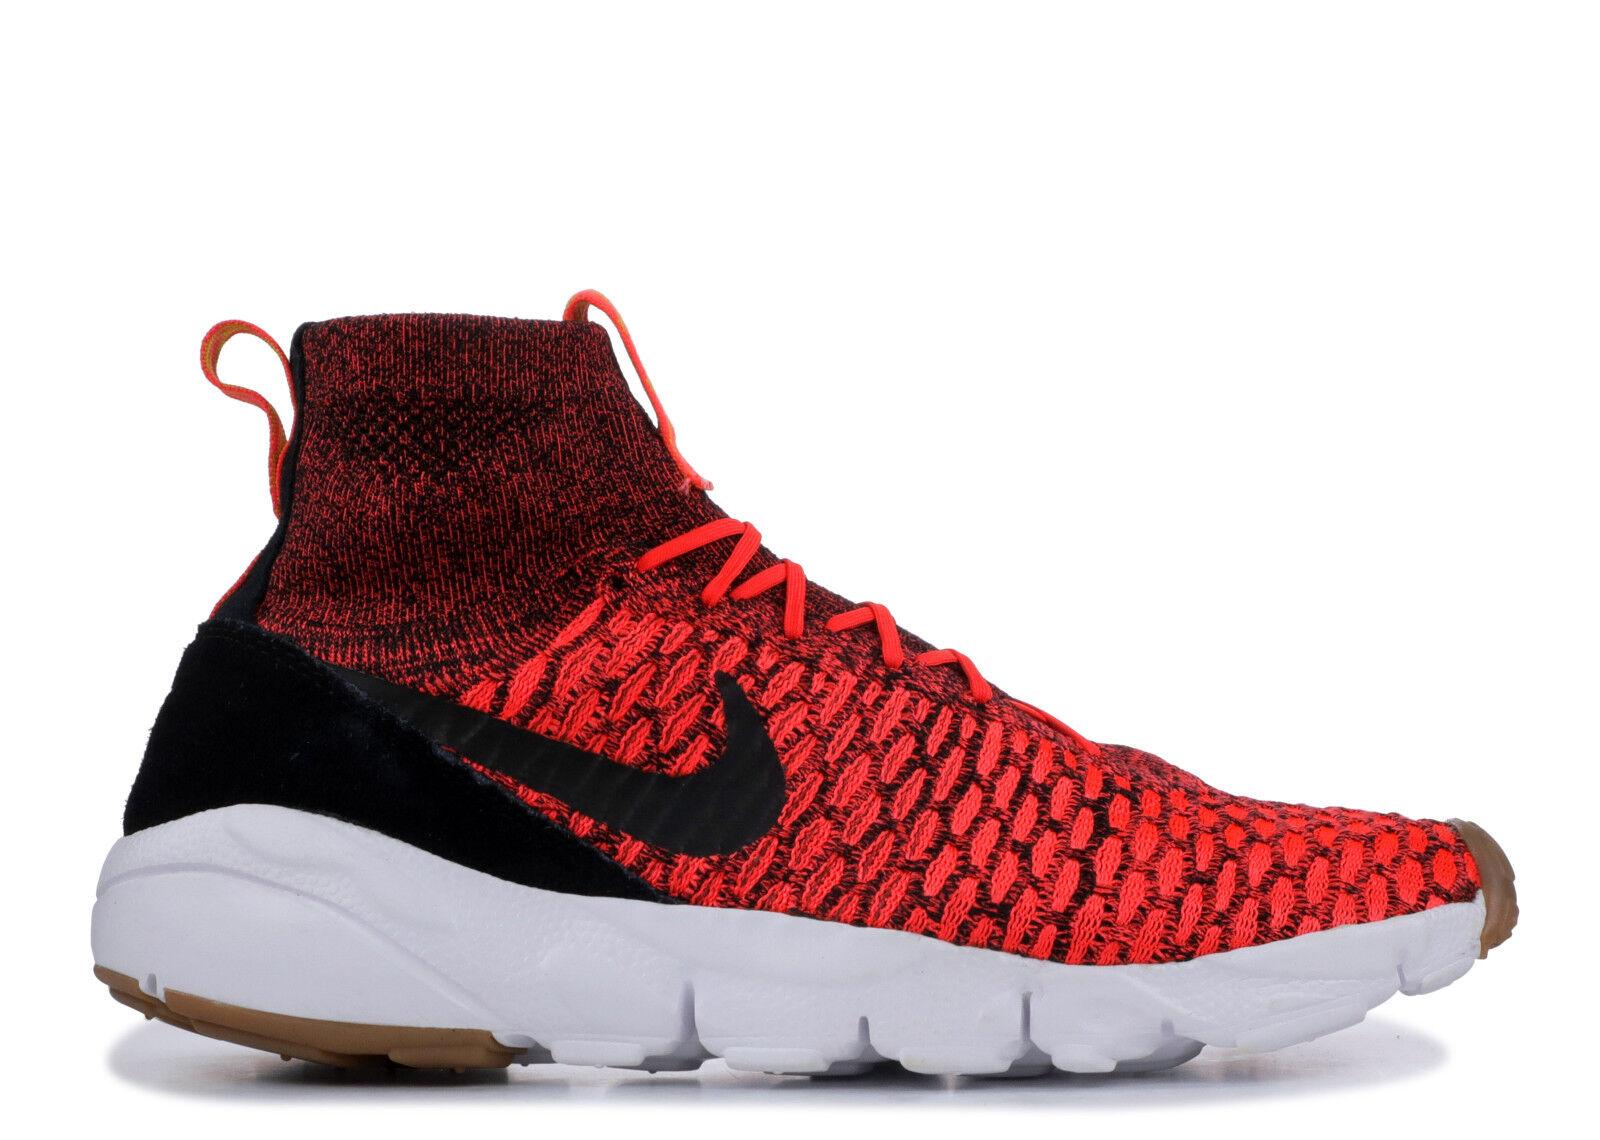 Nike Air Footpse Magistra  Flyertah Mens 13 Crimson rosso nero Gum oro 8165600  risparmiare fino all'80%